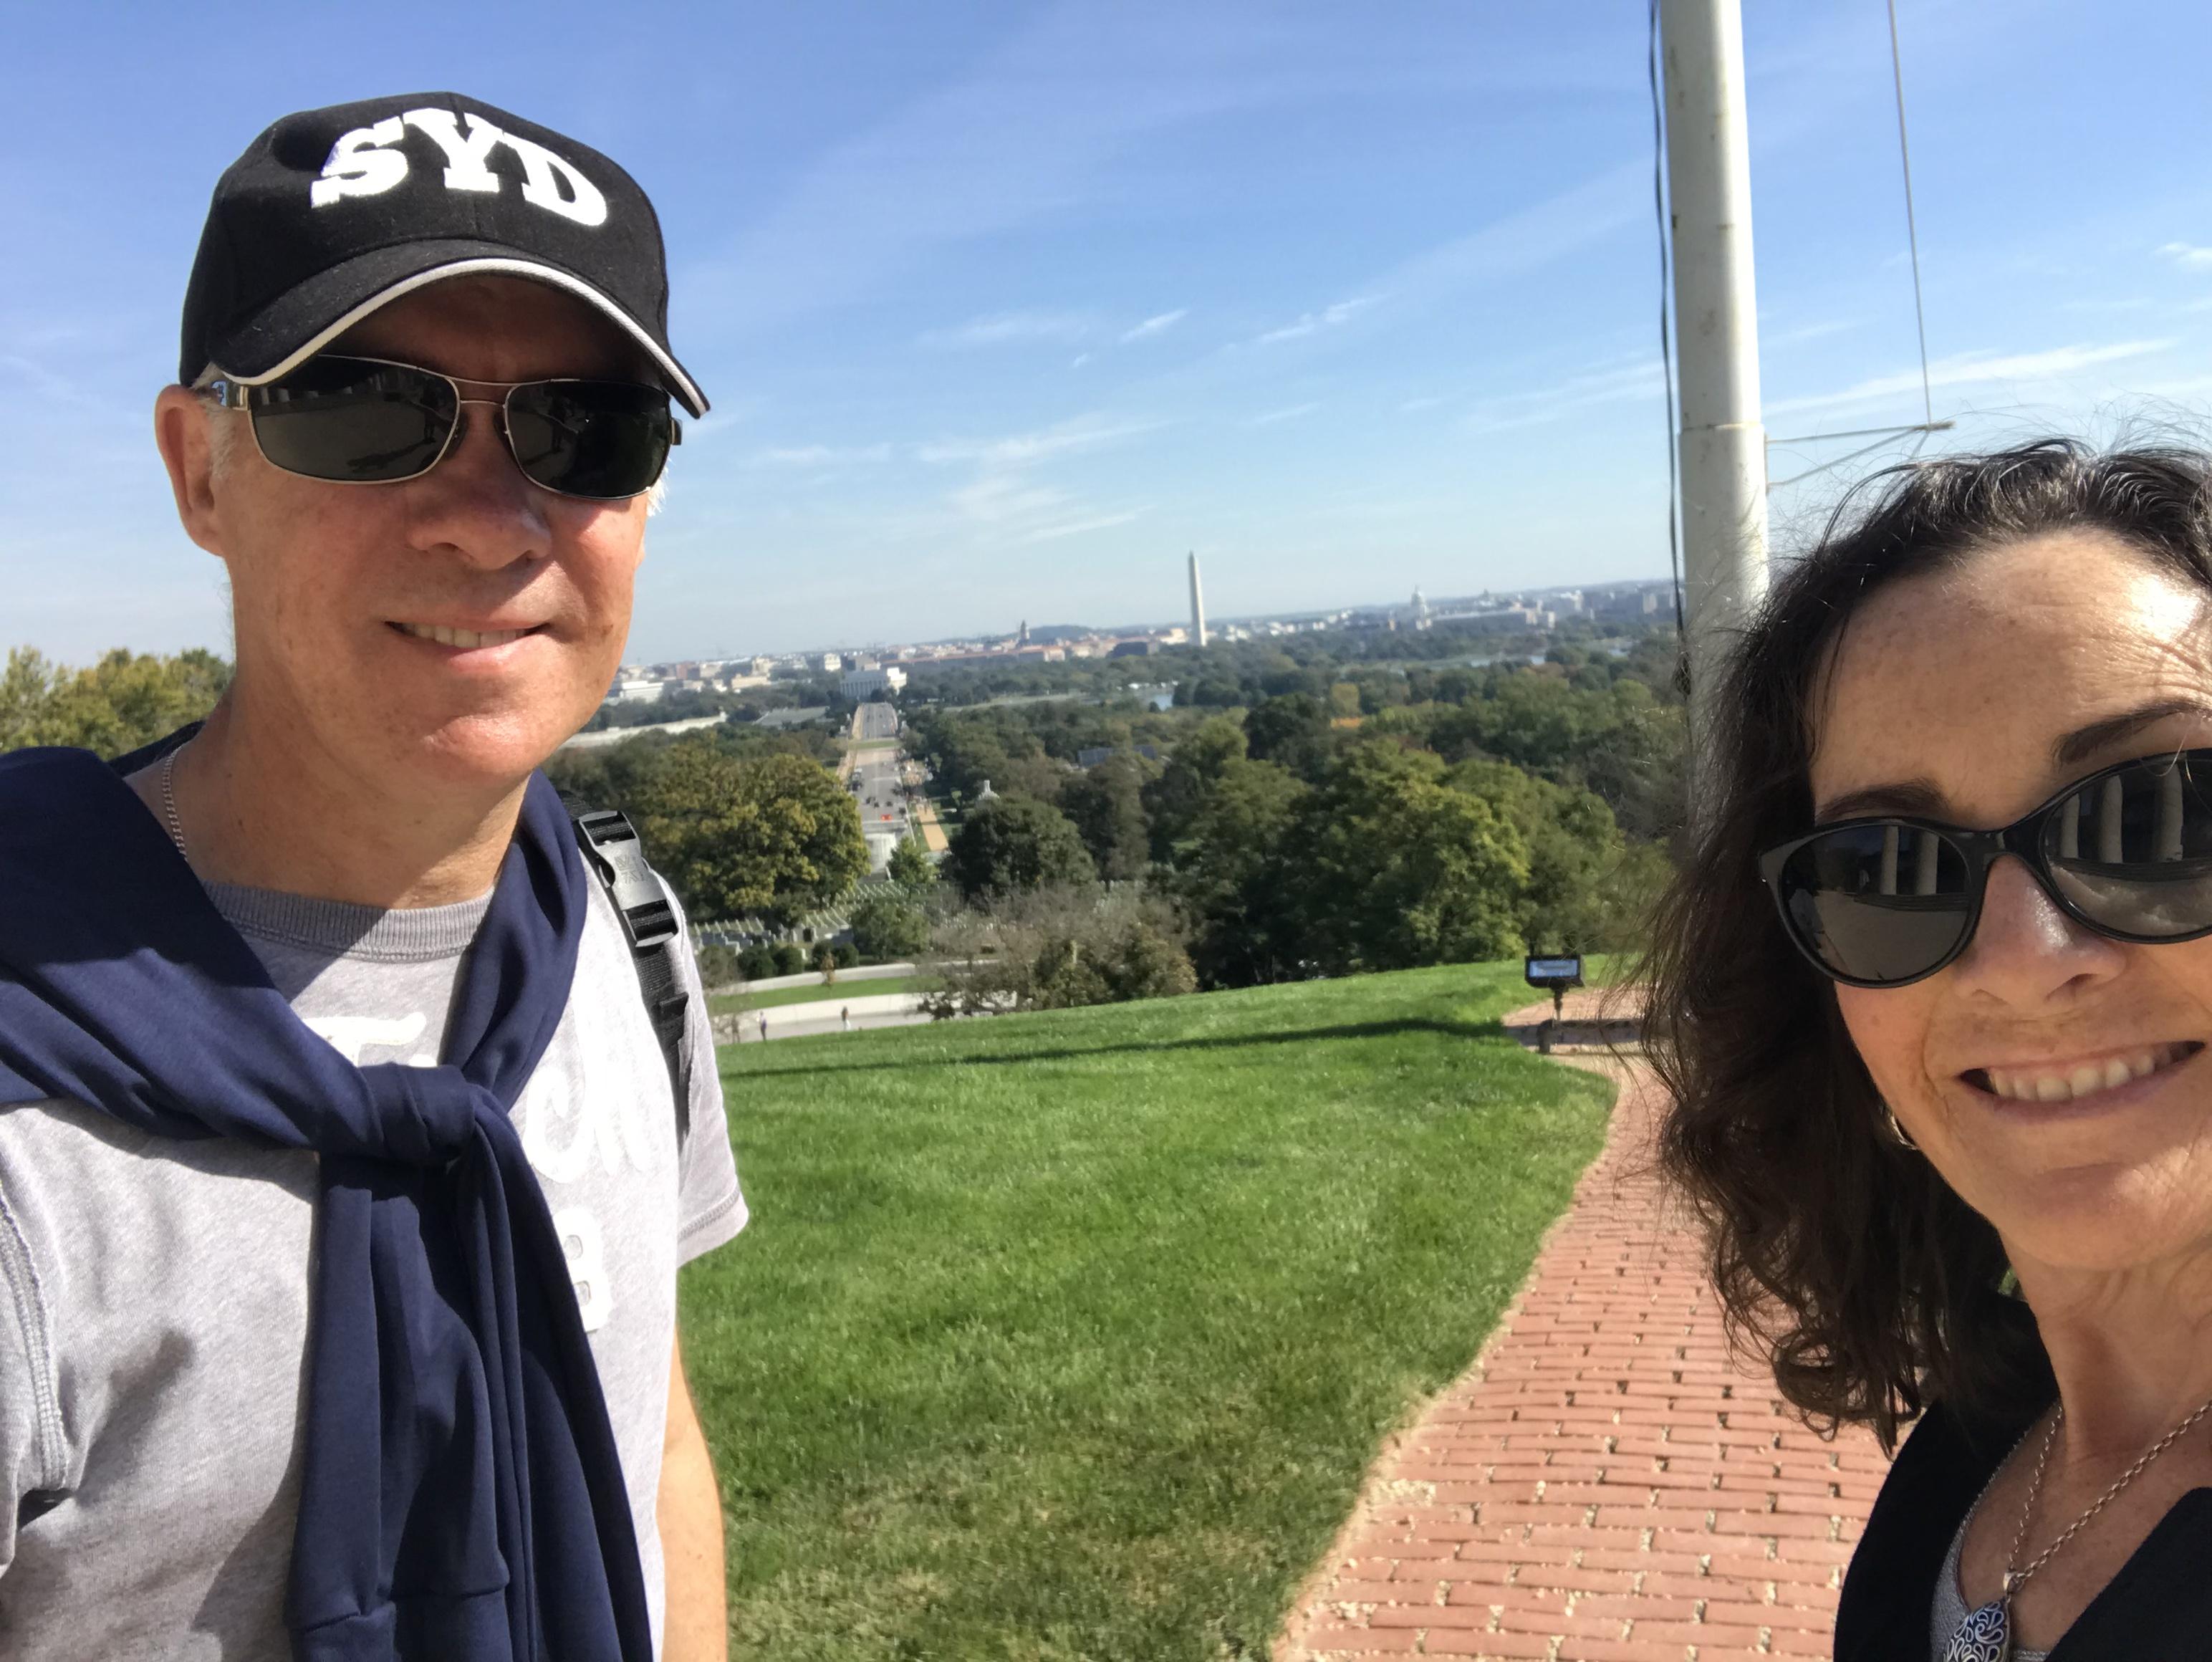 Day 2 Washington